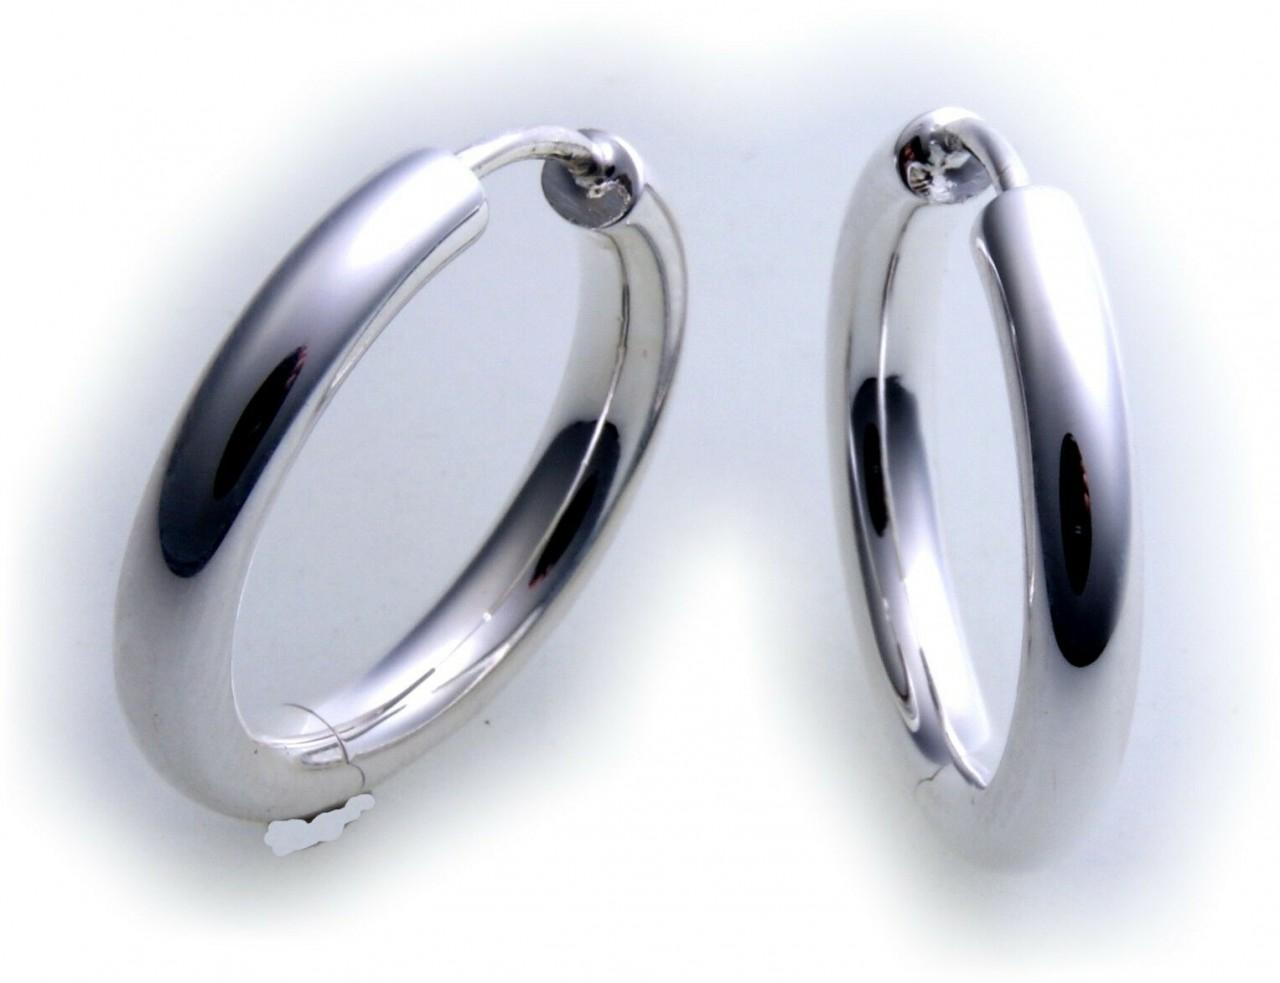 Ohrringe Klapp Creolen echt Silber 925 Sterlingsilber 21 mm